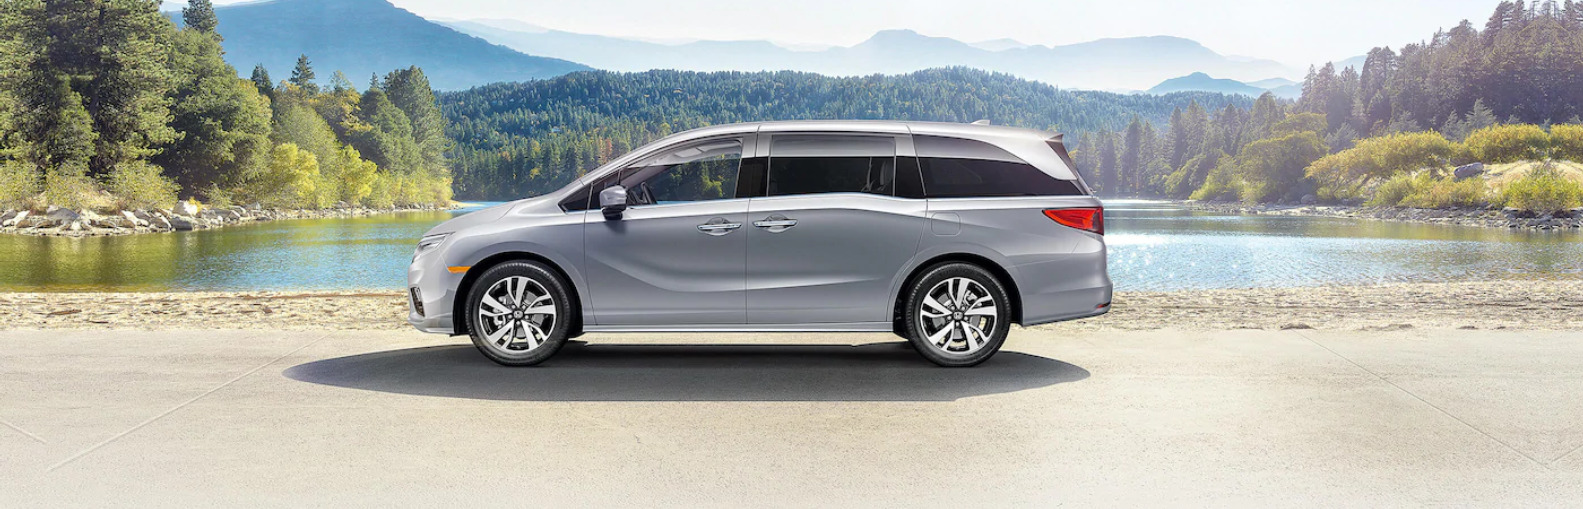 2020 Honda Odyssey Leasing near Richmond, VA